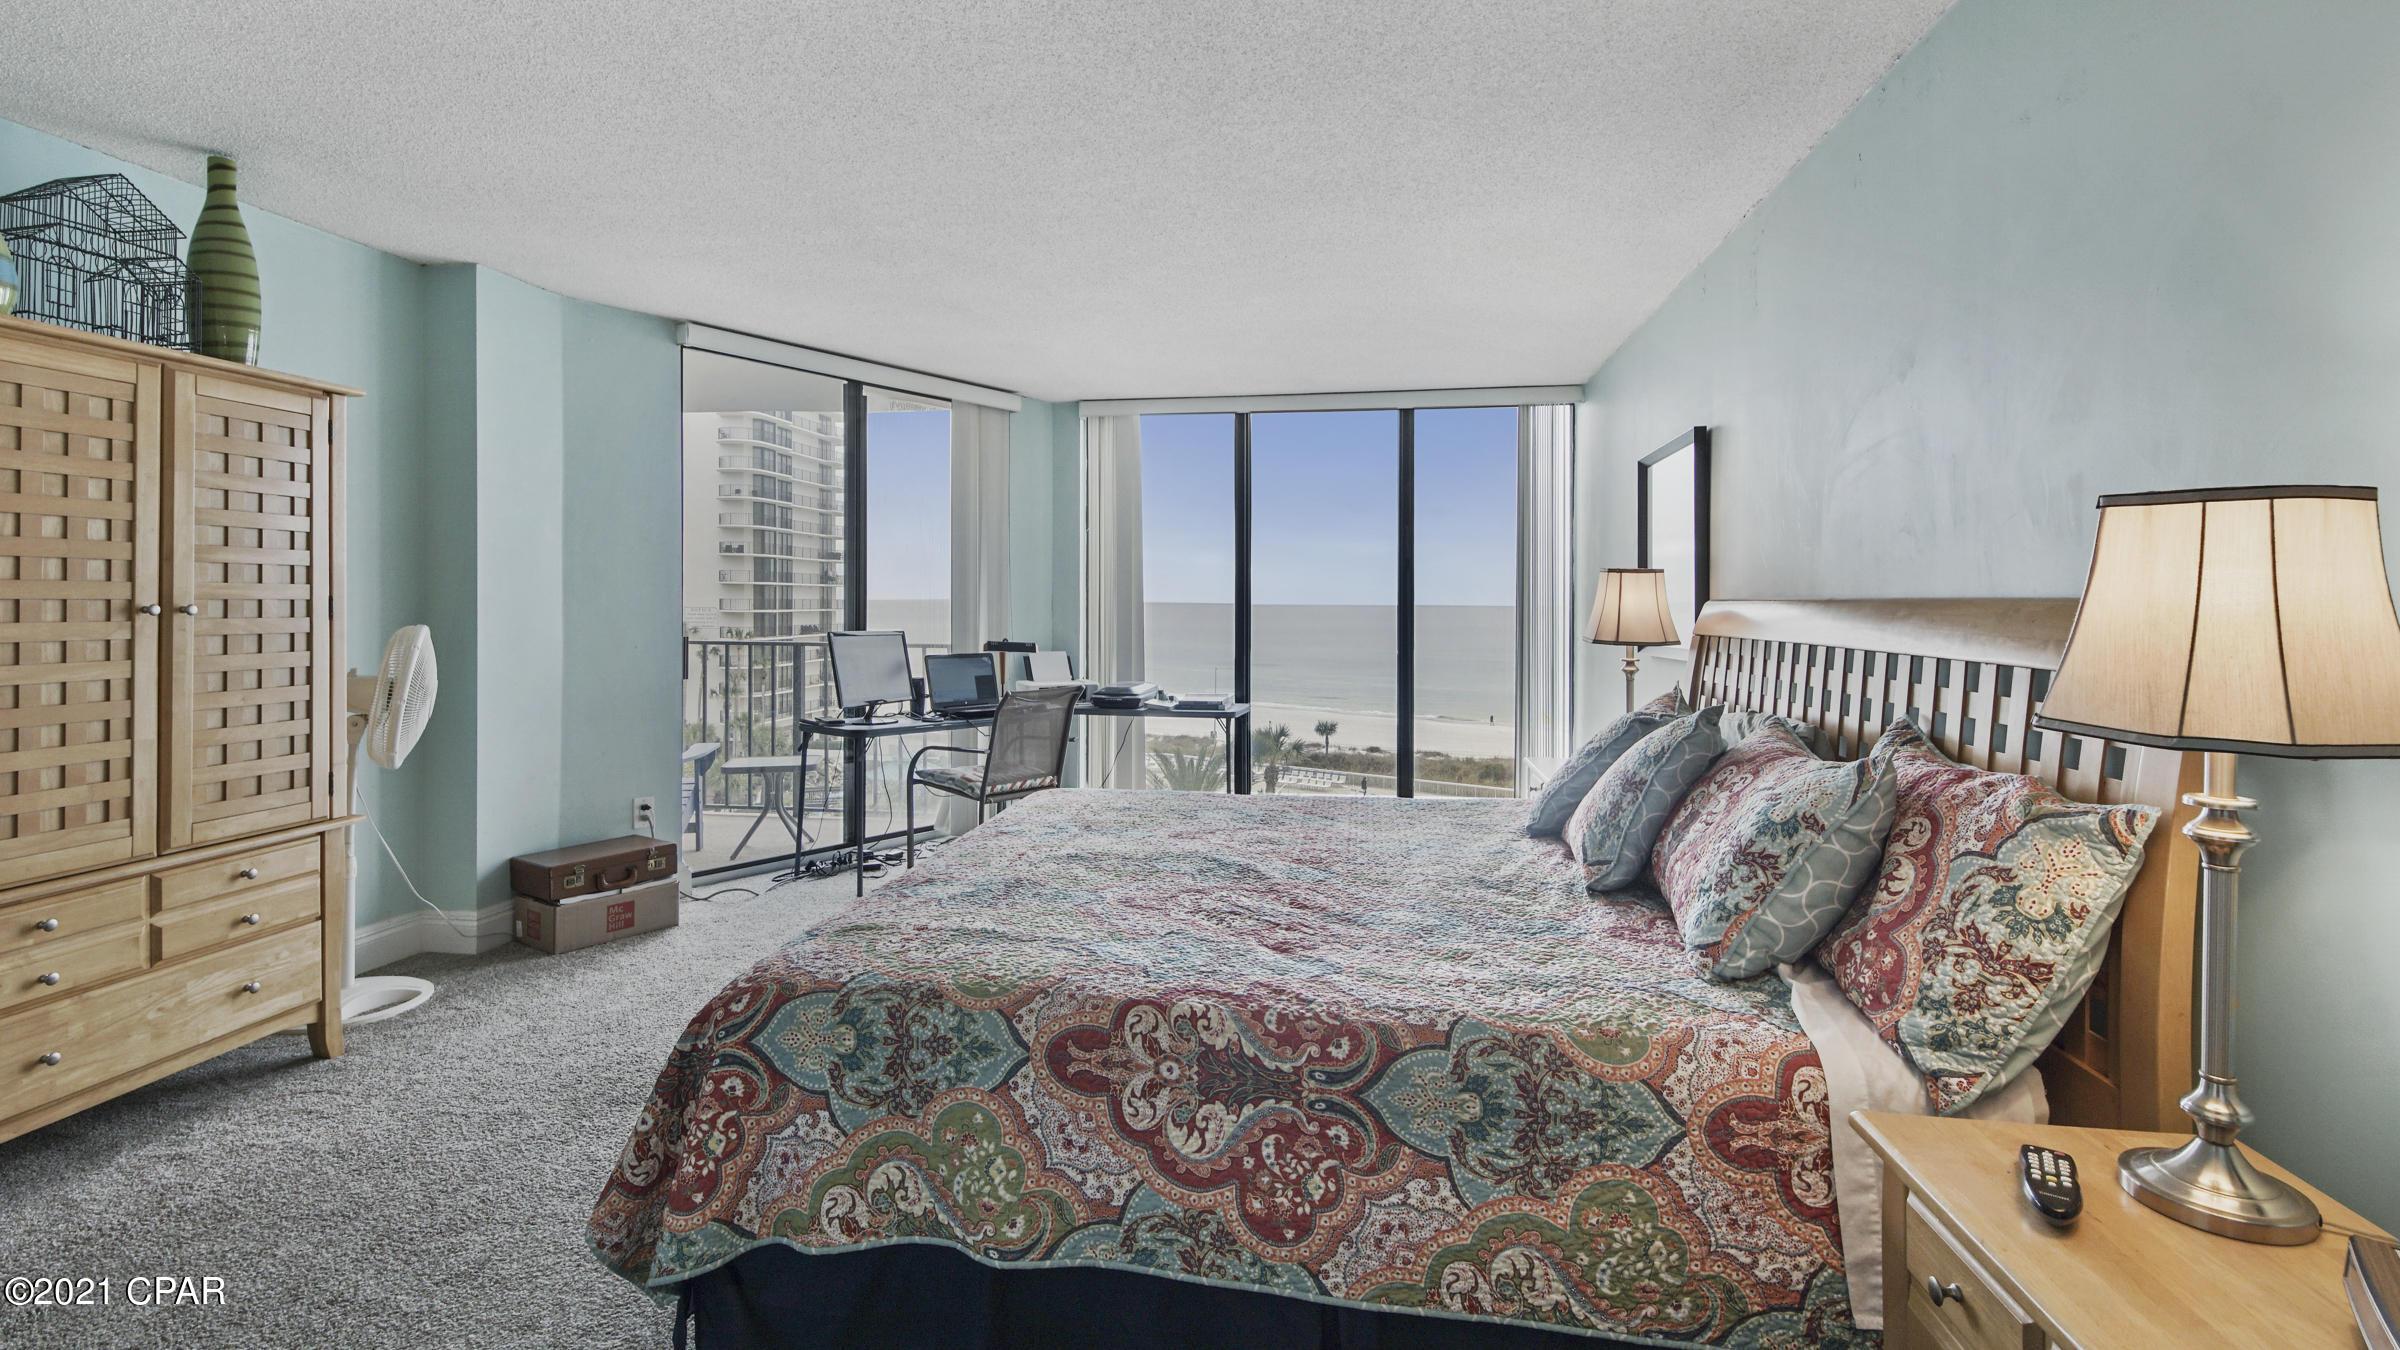 A 2 Bedroom 2 Bedroom Edgewater Tower I Condominium